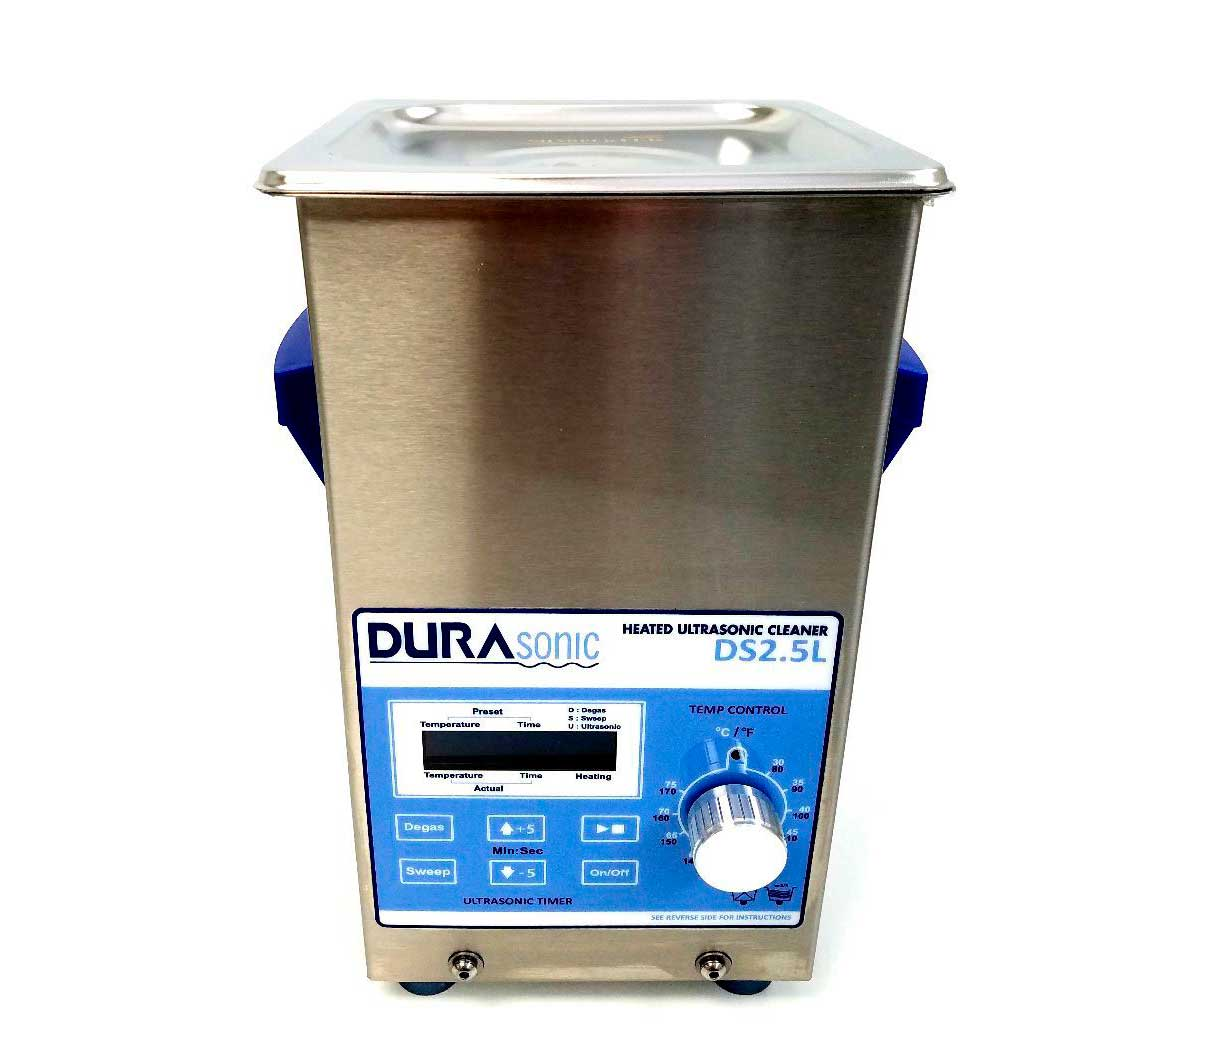 DuraSonic 1/2 Gal Digital Ultrasonic Cleaner